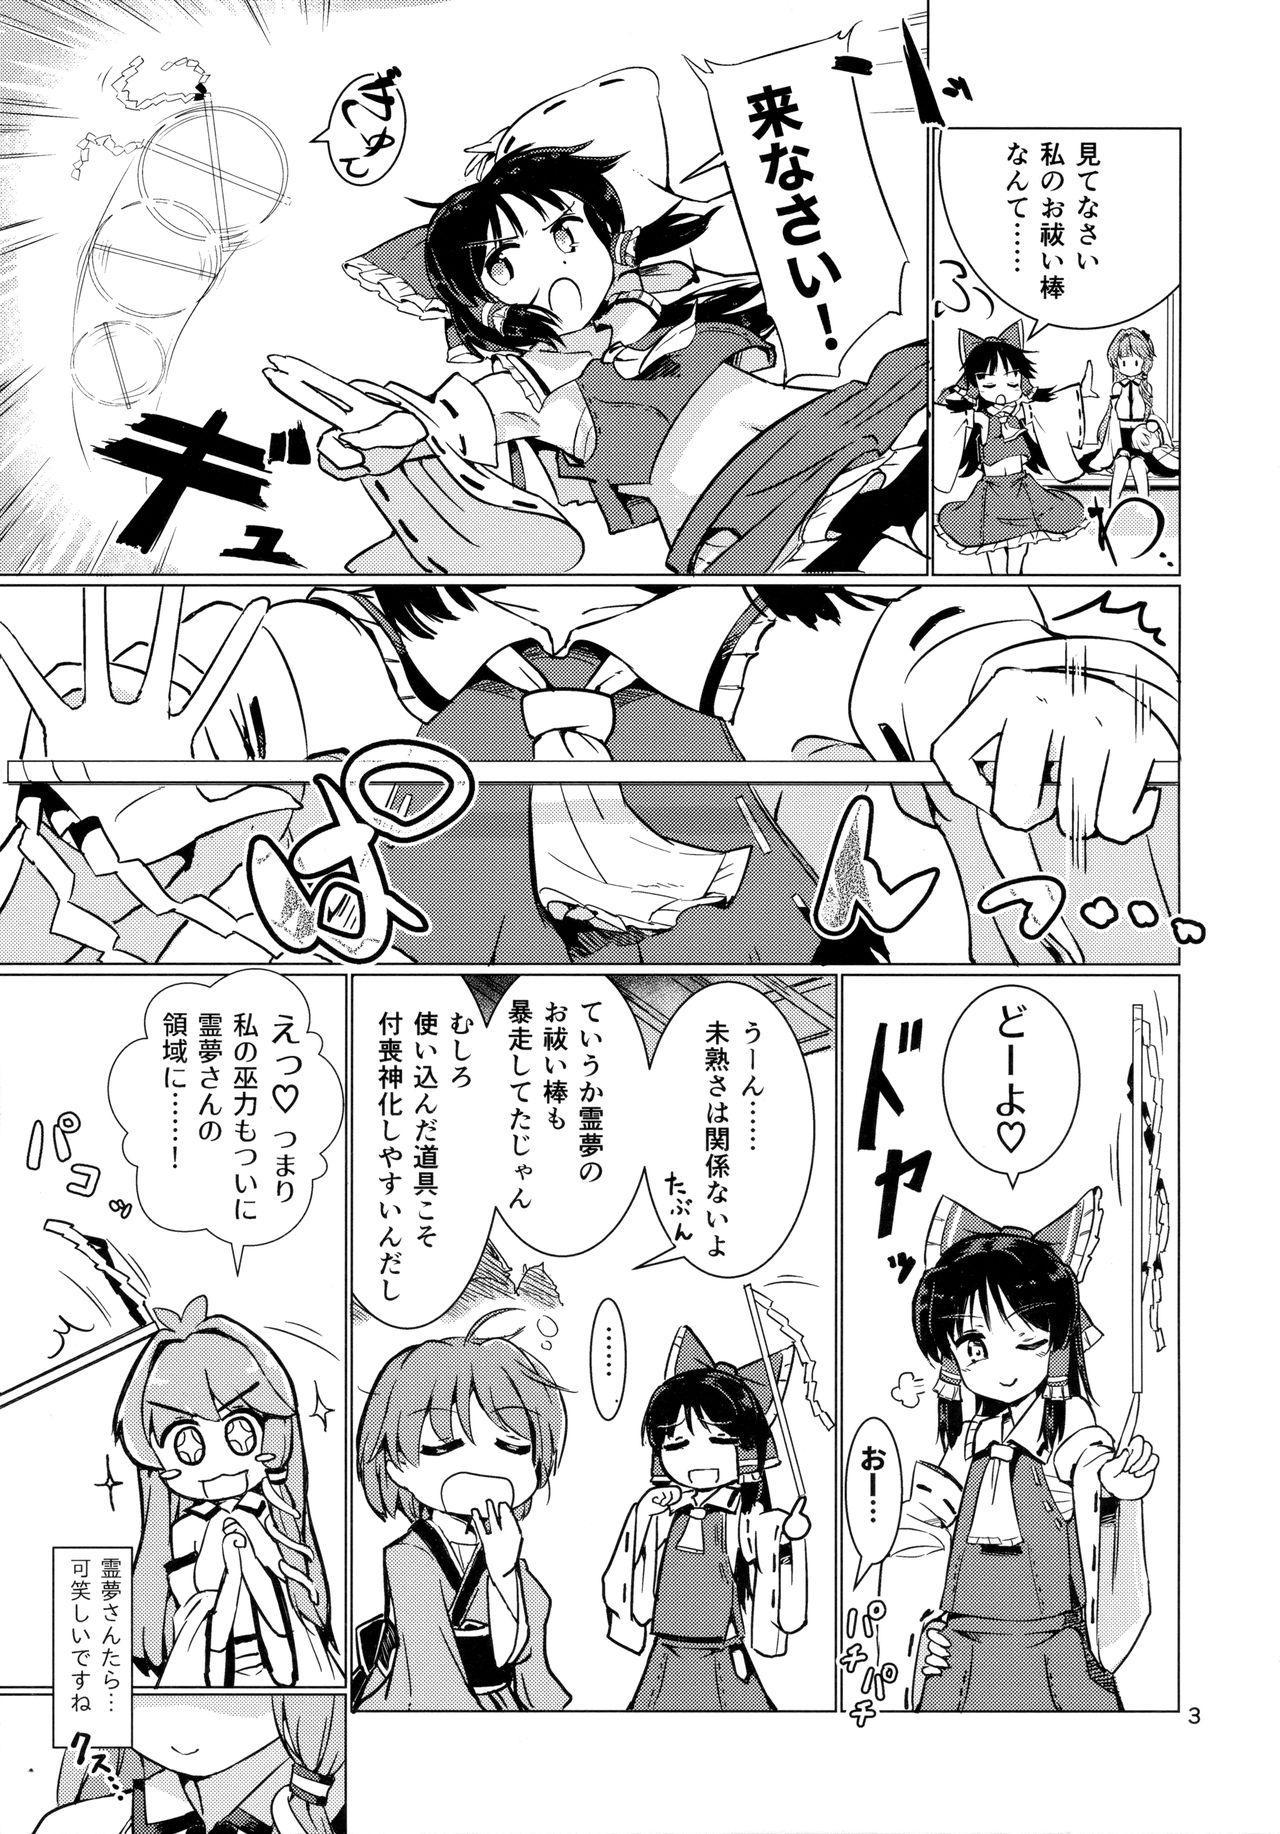 Sanae-san no Oharaibou ni Naritai!! 3